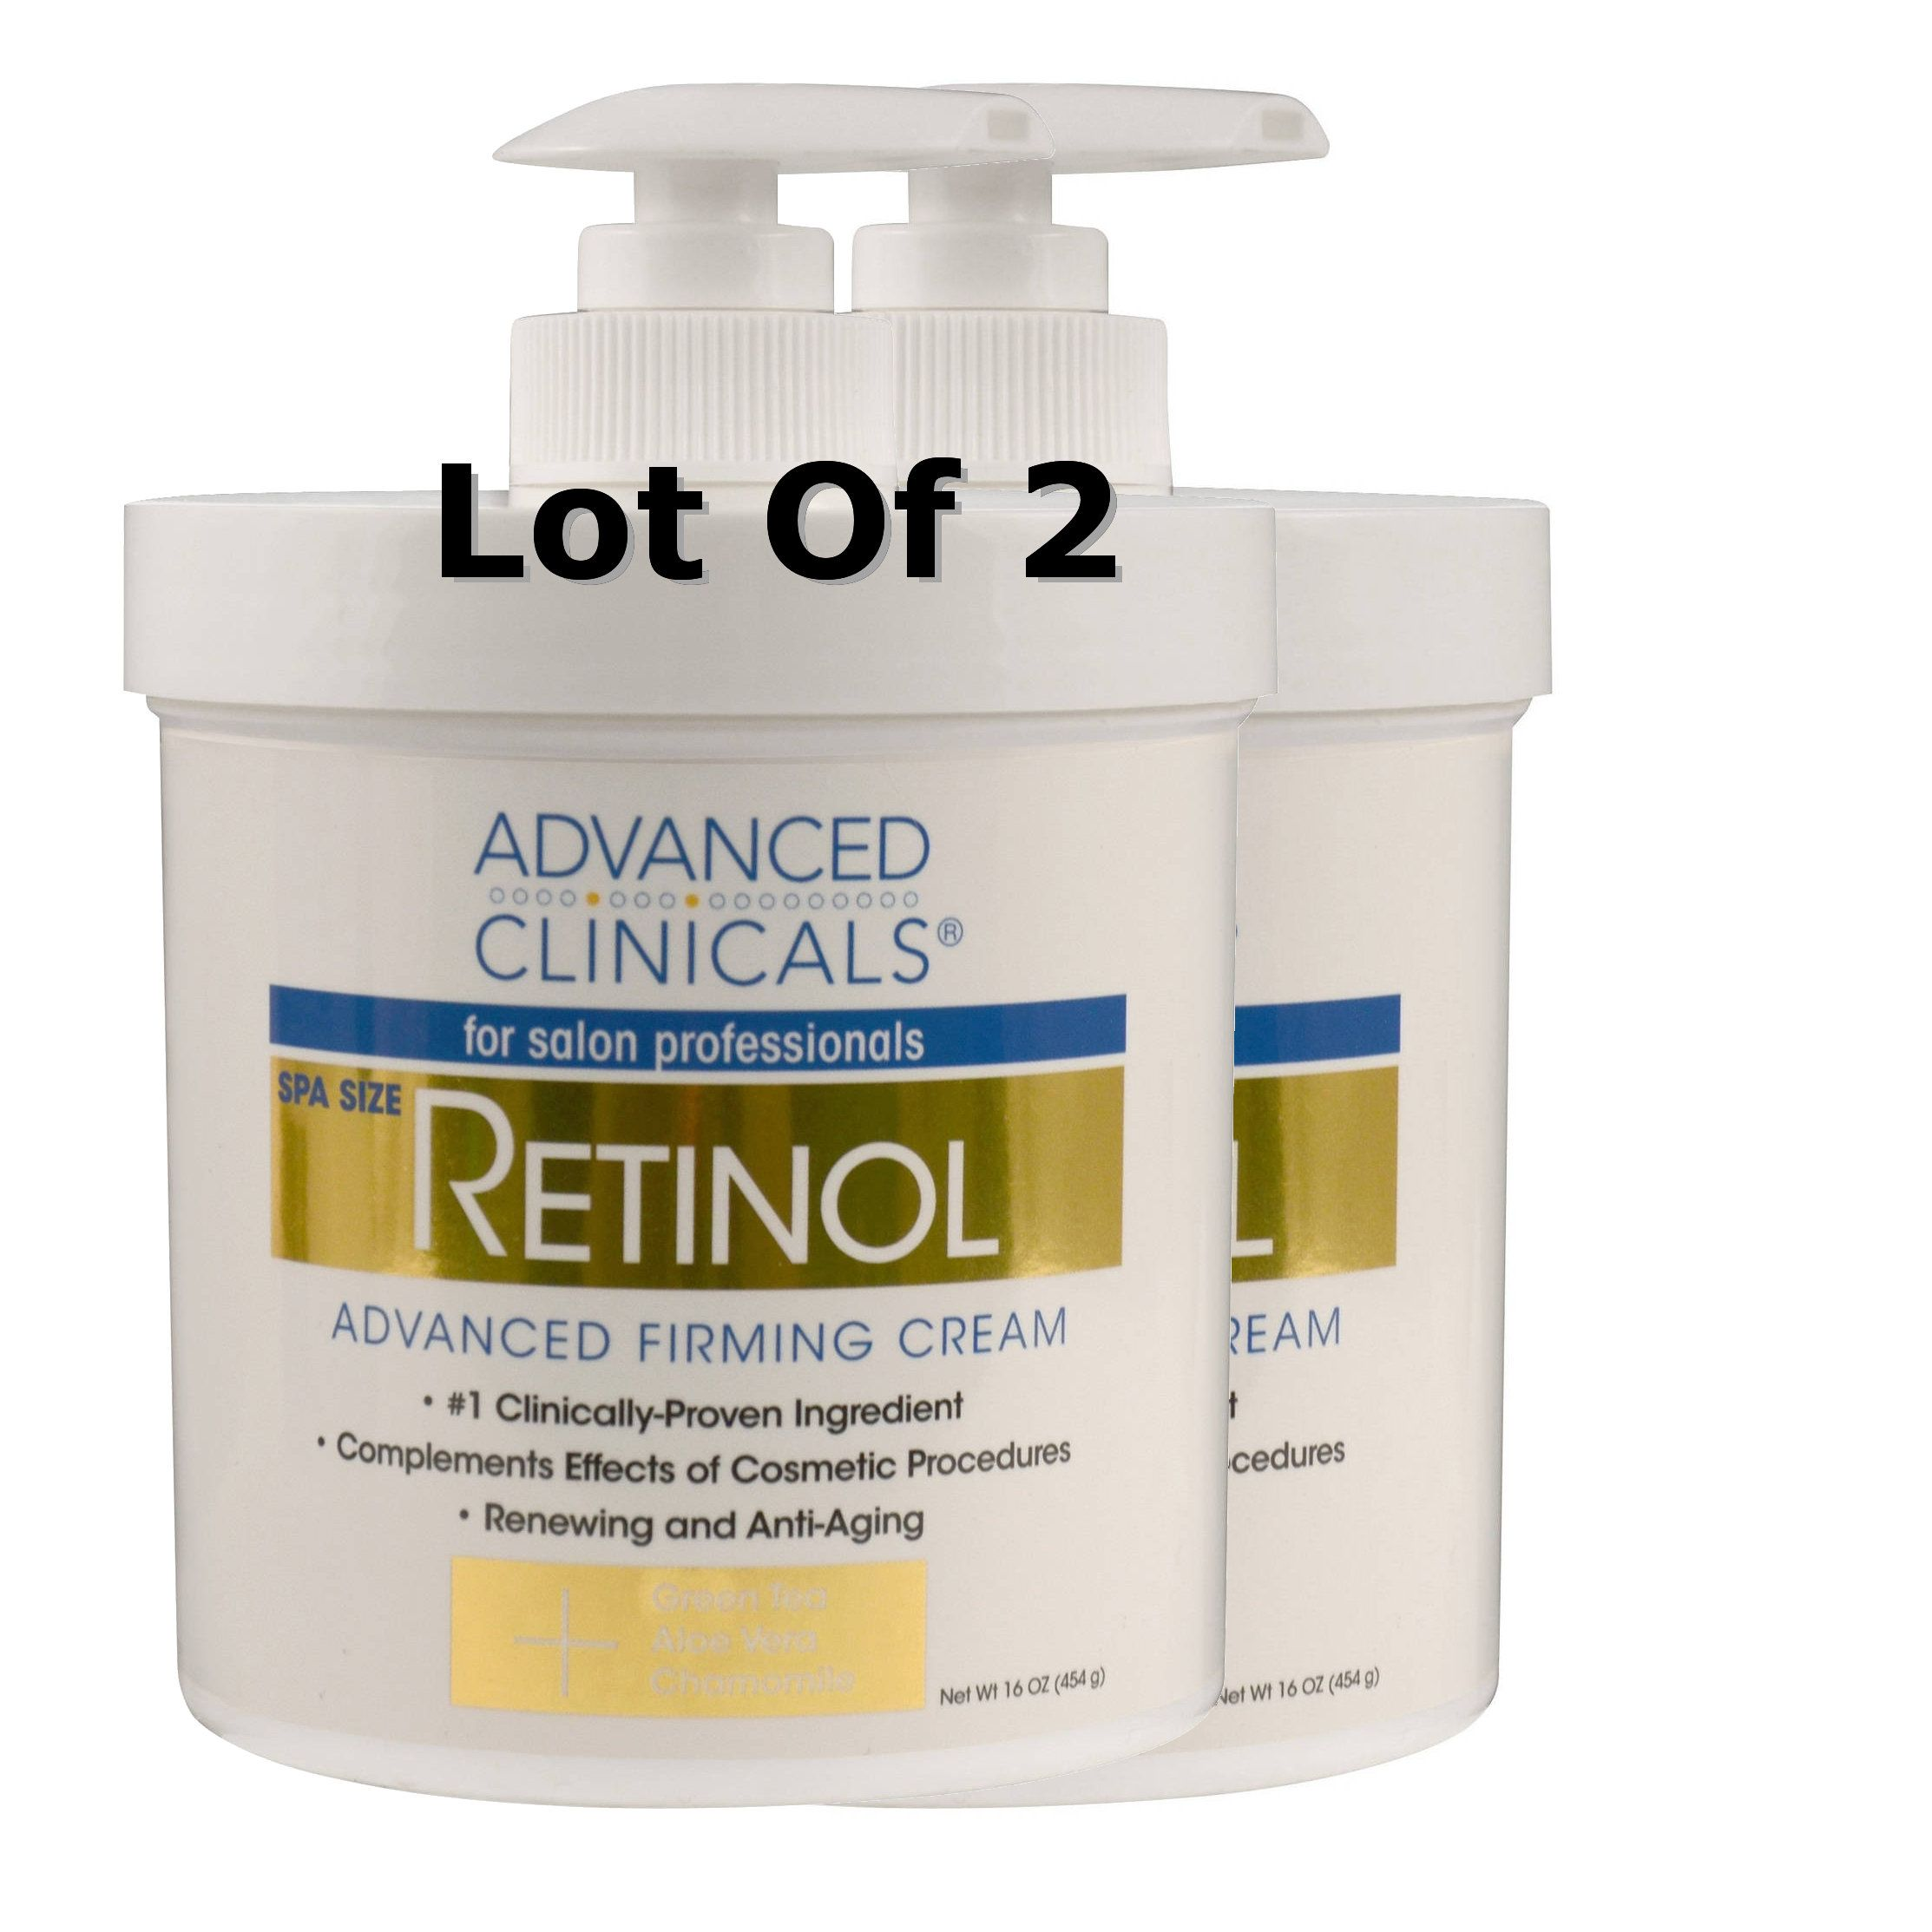 2 Advanced Clinicals Retinol Firming Cream Salon Professionals Spa 32oz Total Helps Erase The Appearance Of Wrin Retinol Firming Cream Firming Cream Retinol